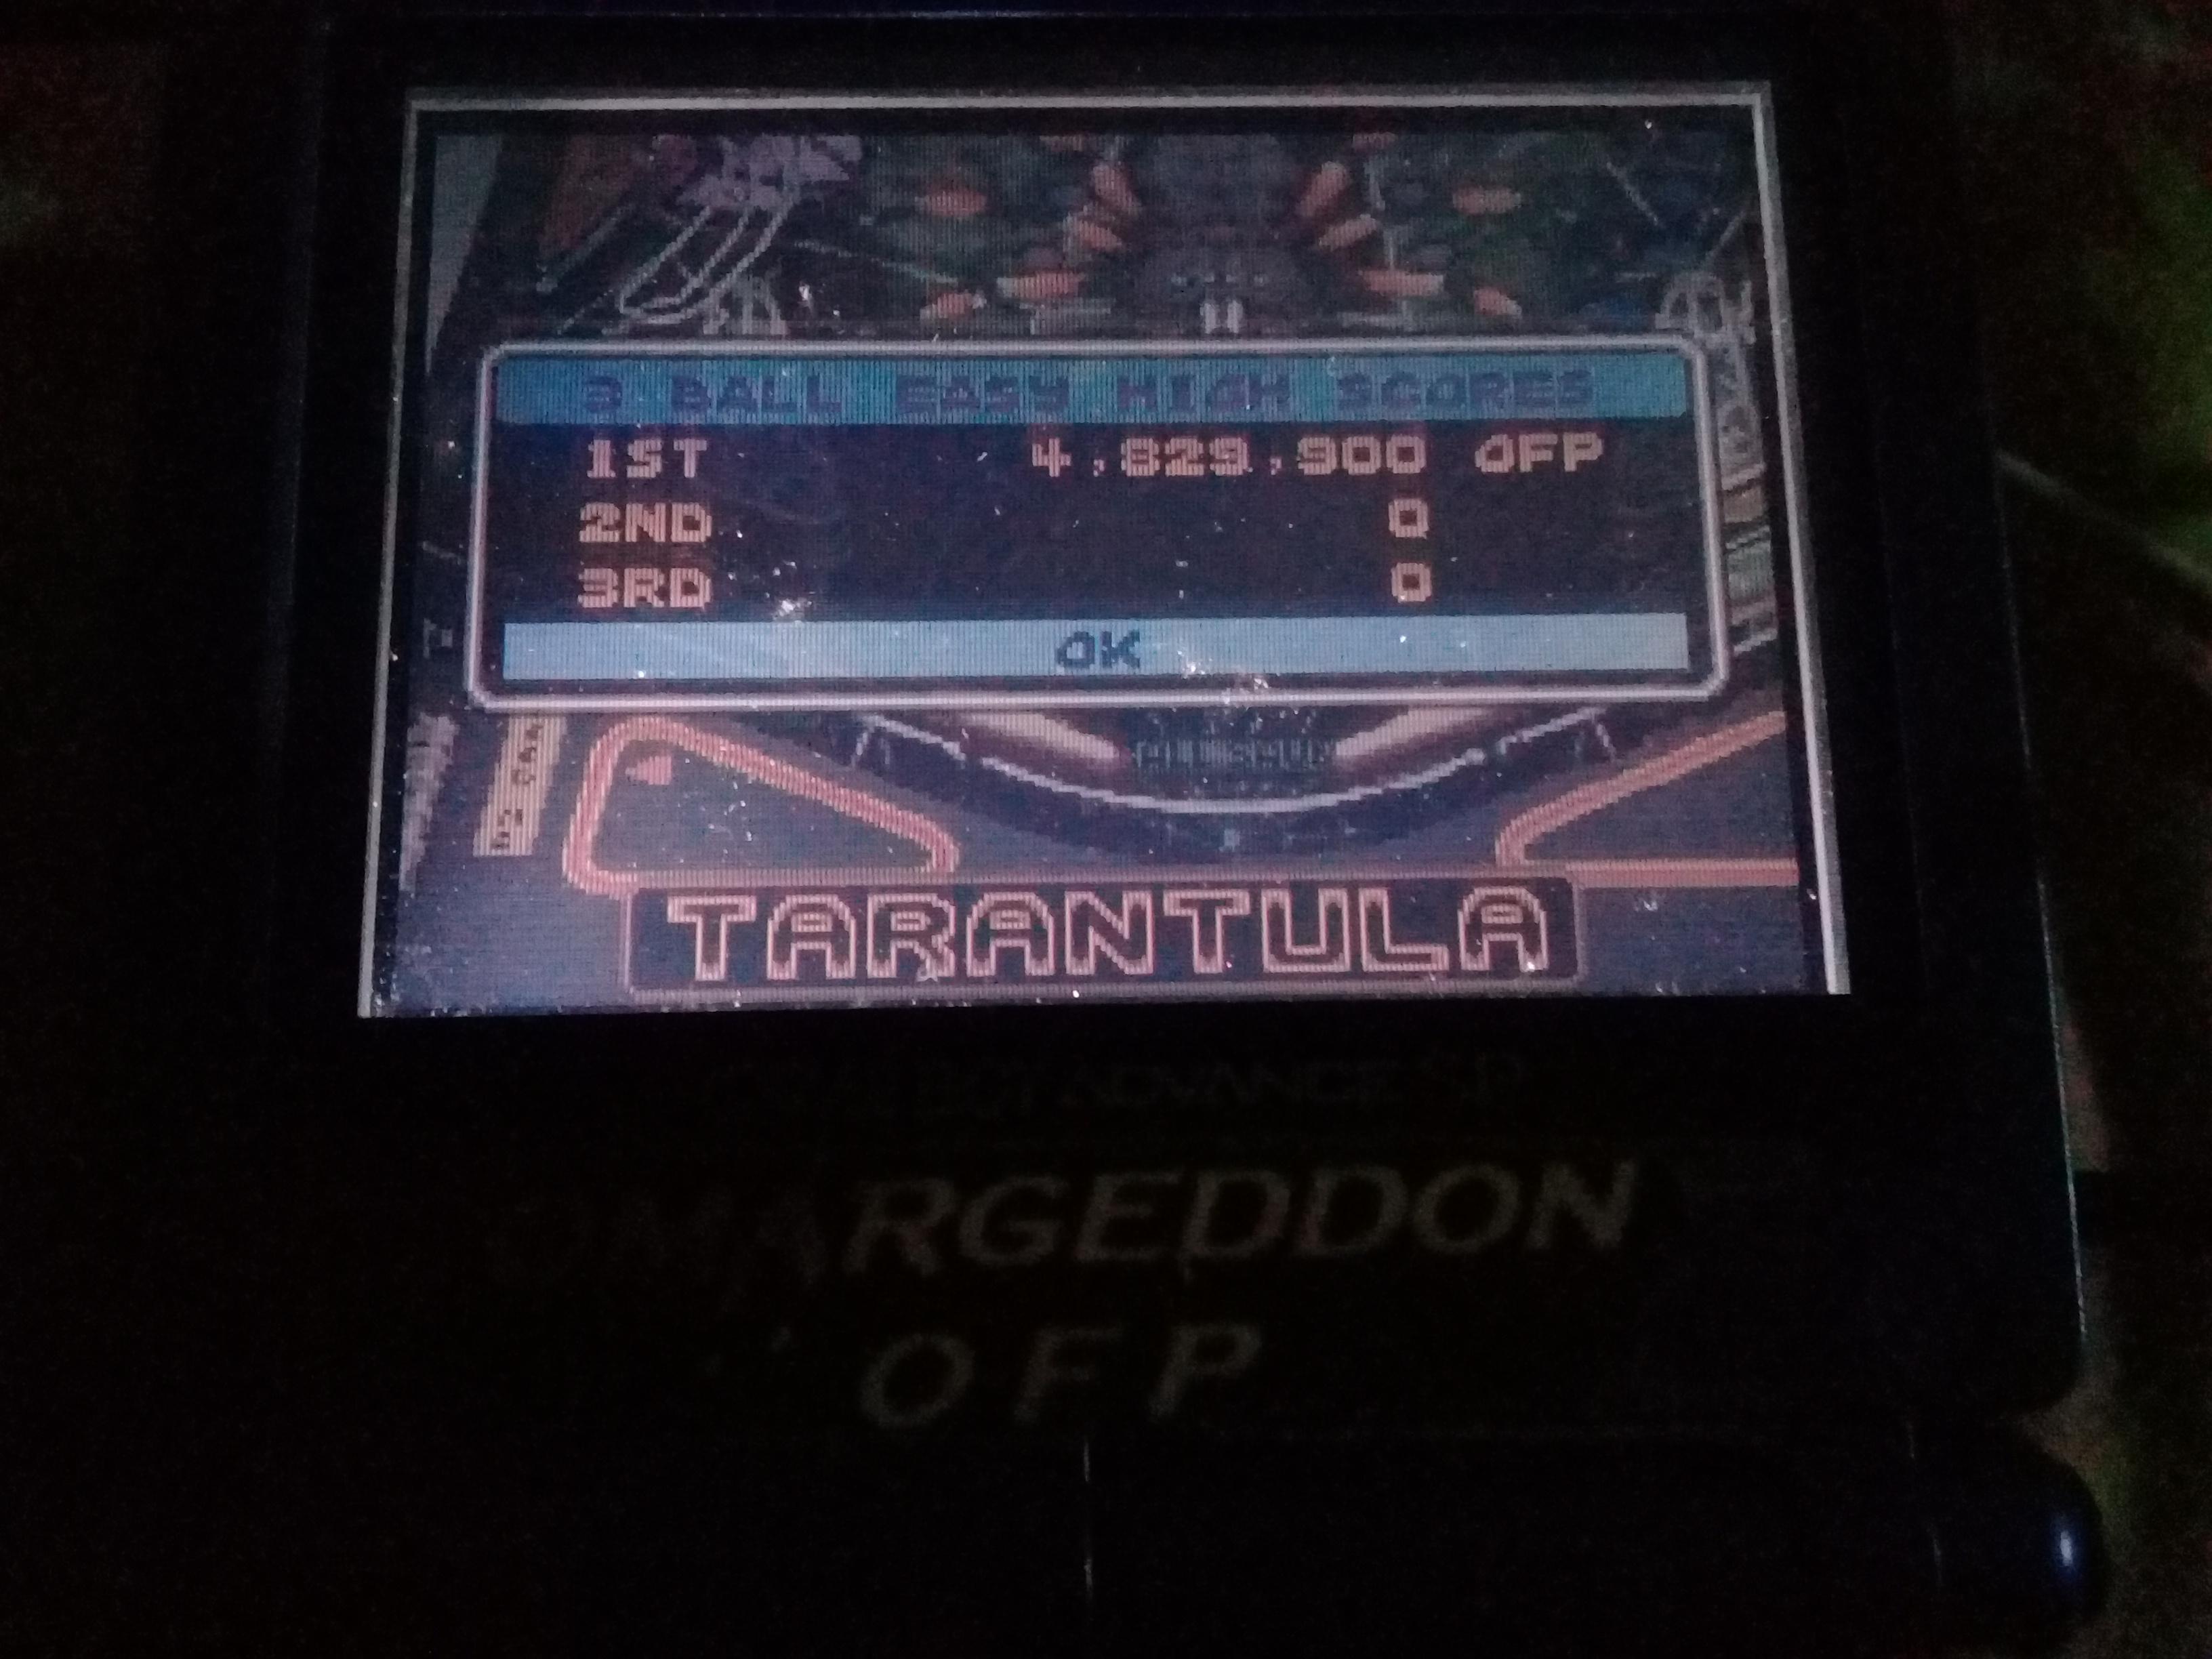 omargeddon: Pinball Advance: Tarantula [3 Balls] [Easy] (GBA) 4,829,900 points on 2021-03-18 20:42:43